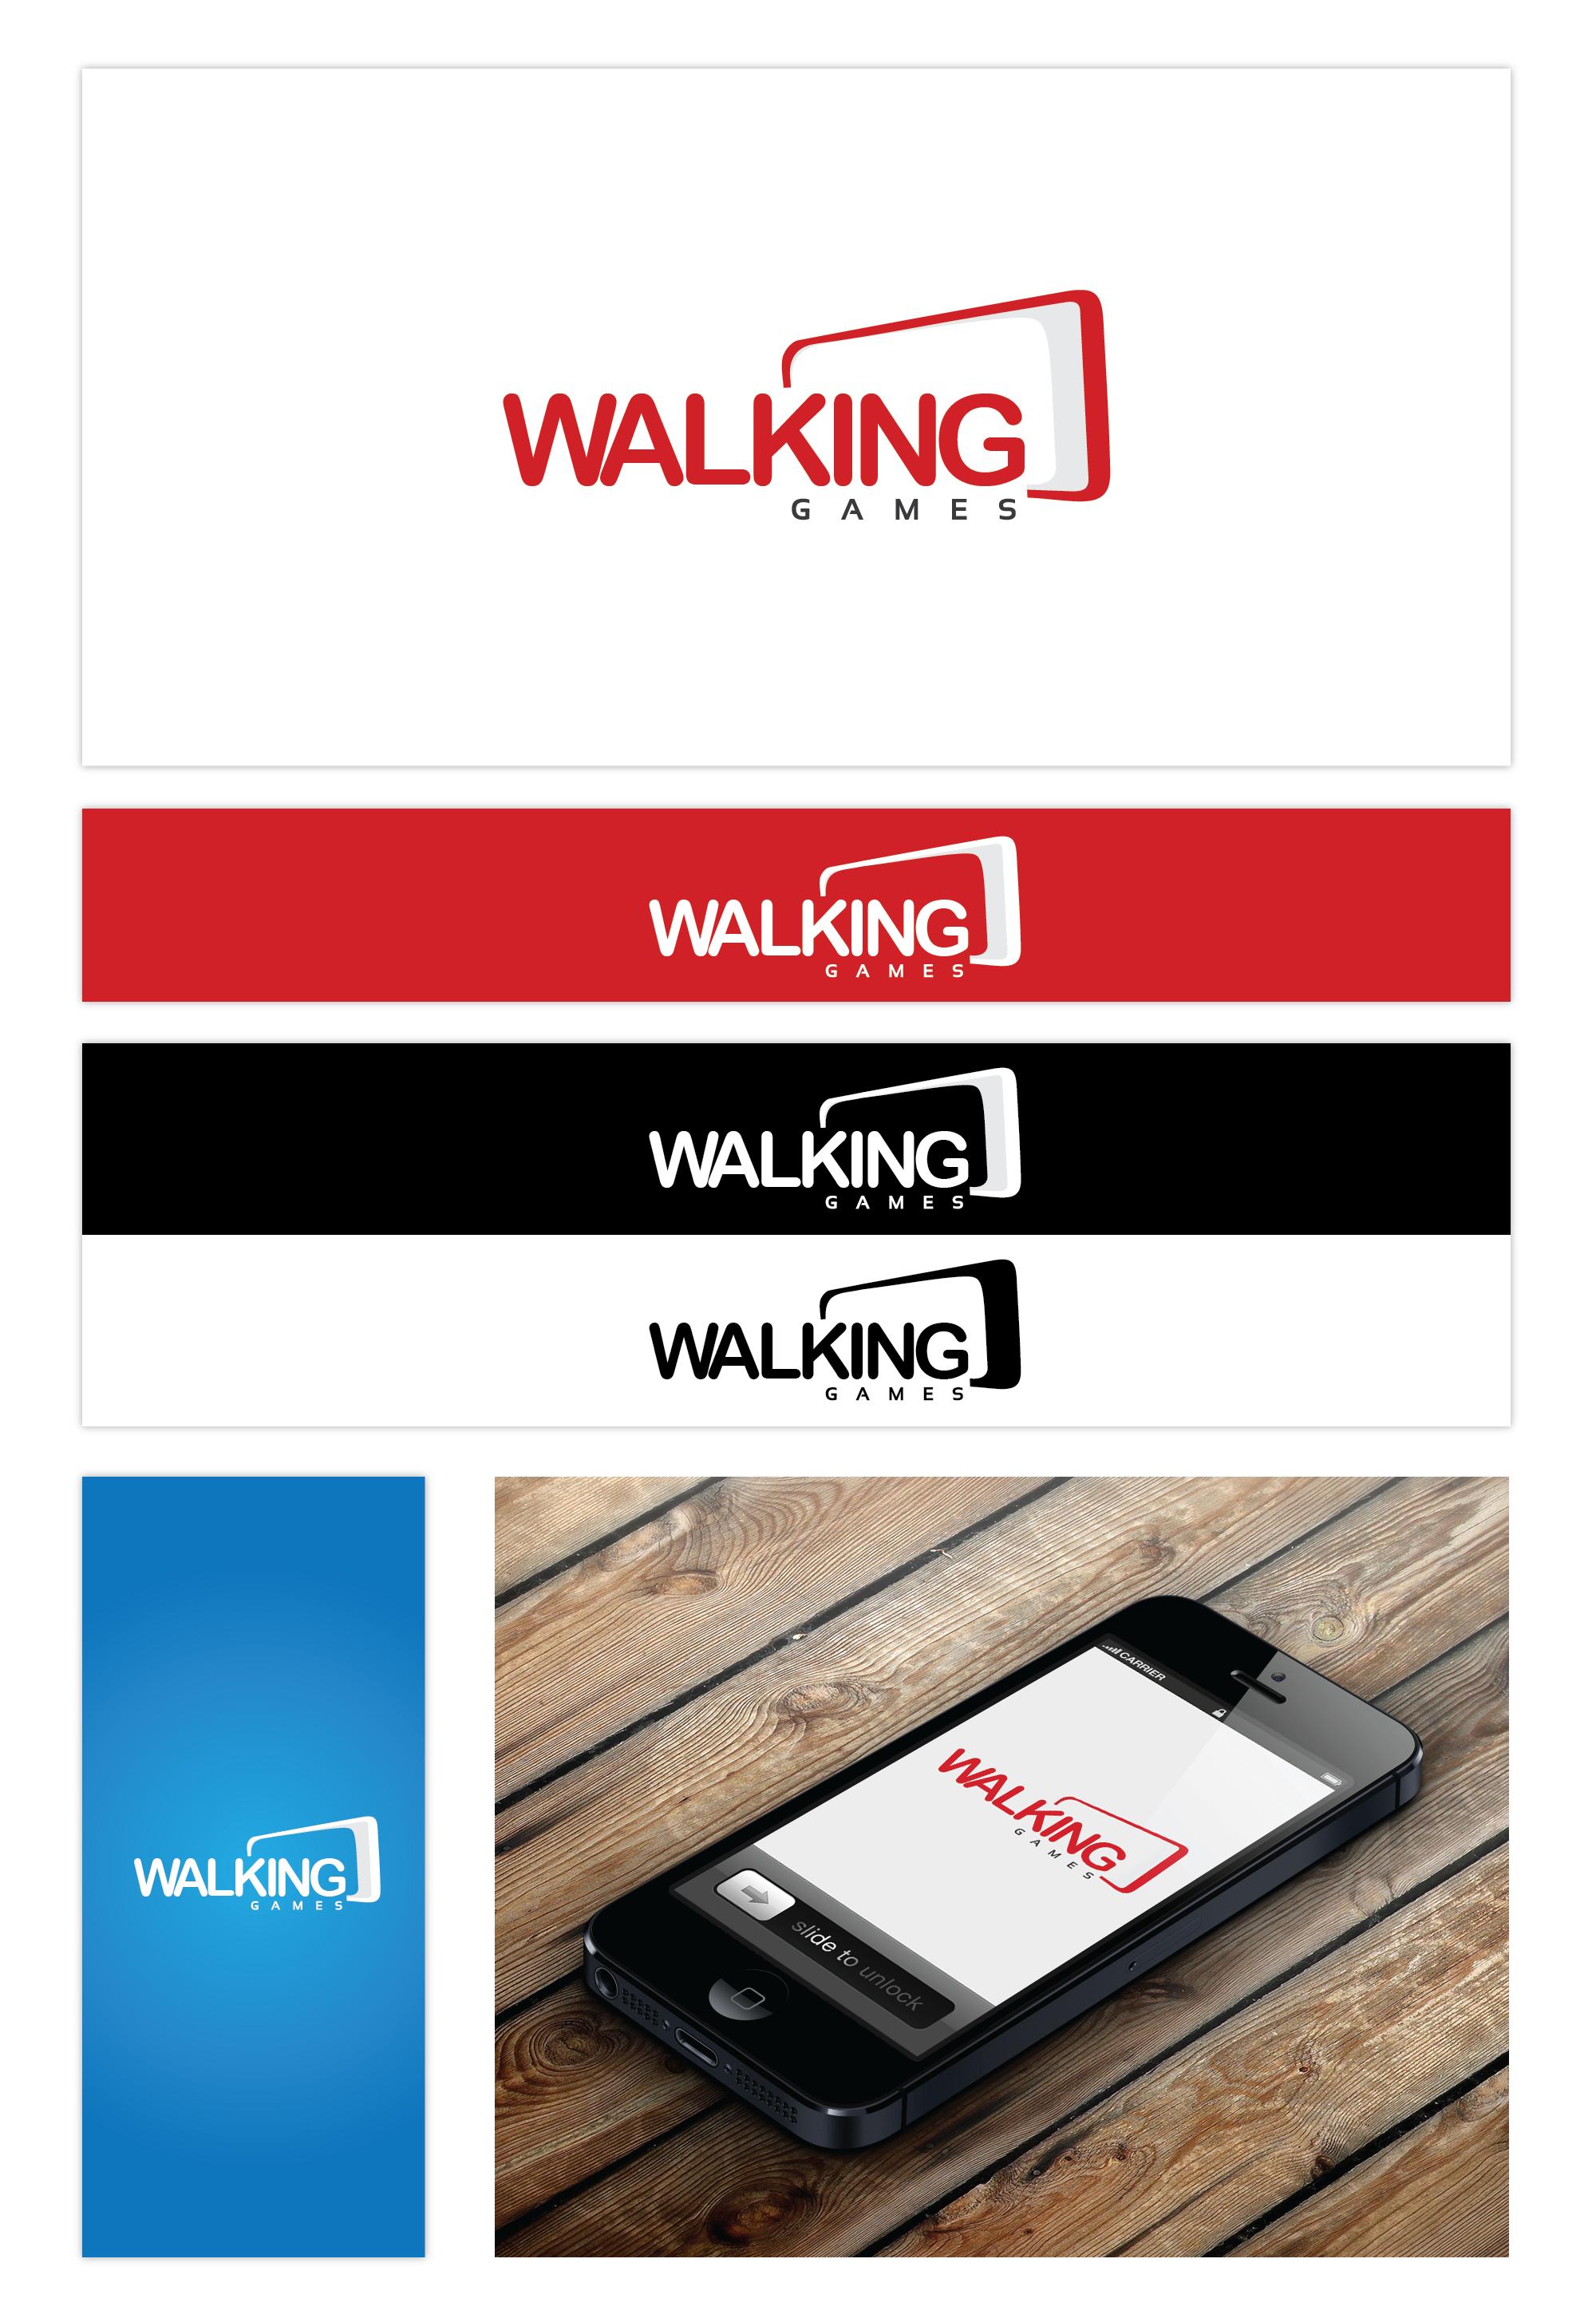 WalkinGames needs a new logo